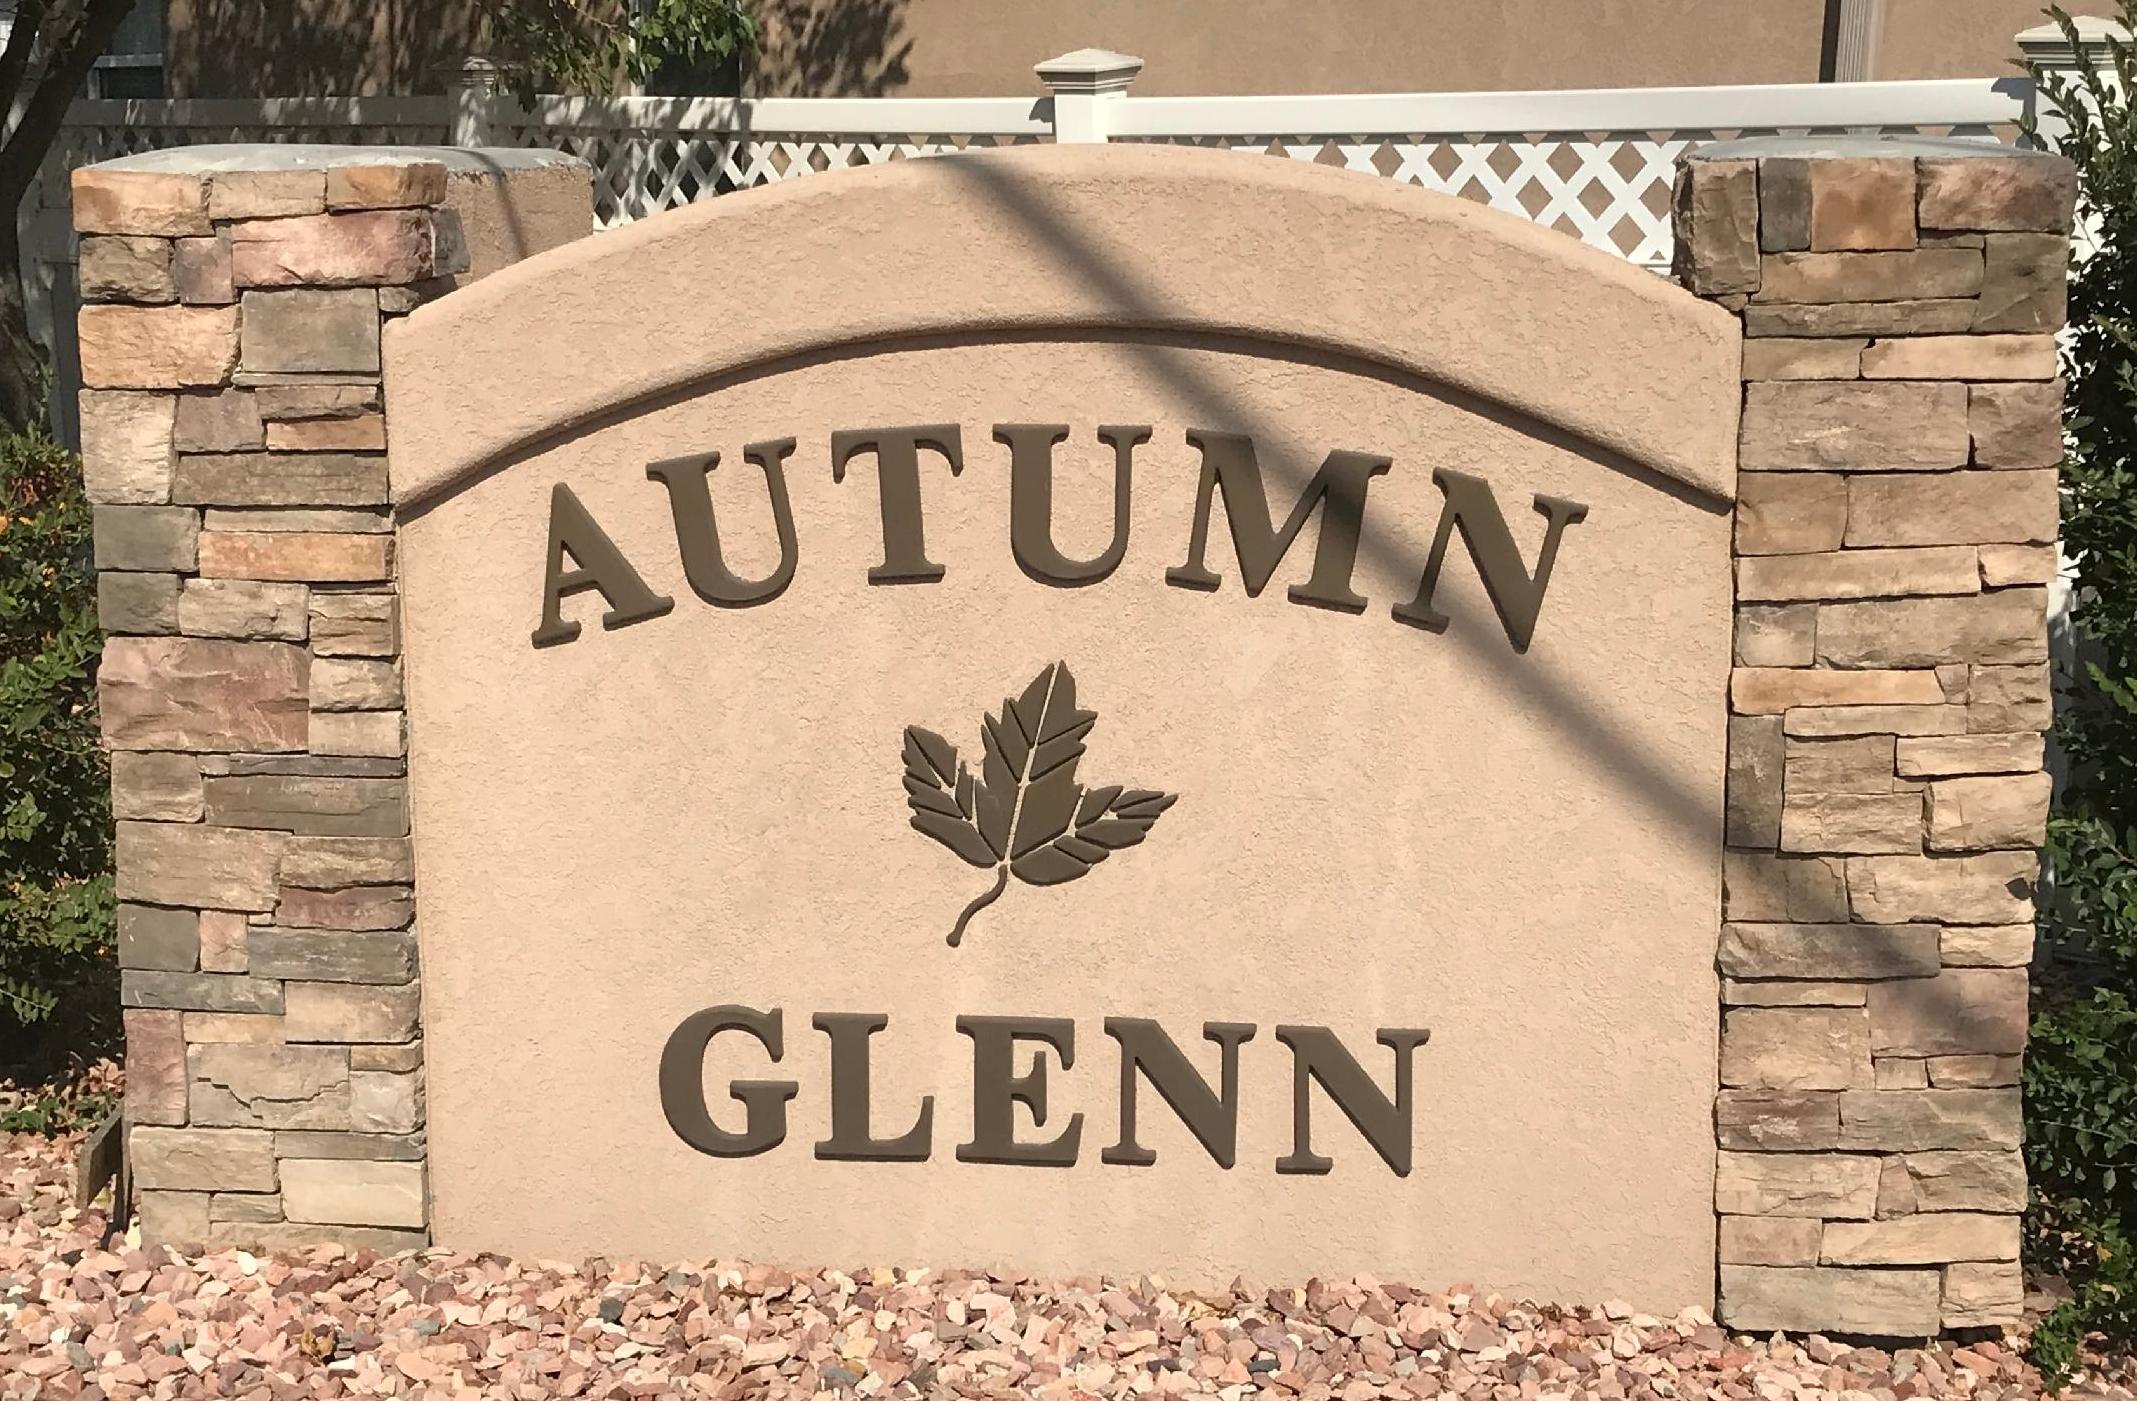 Autumn Glenn